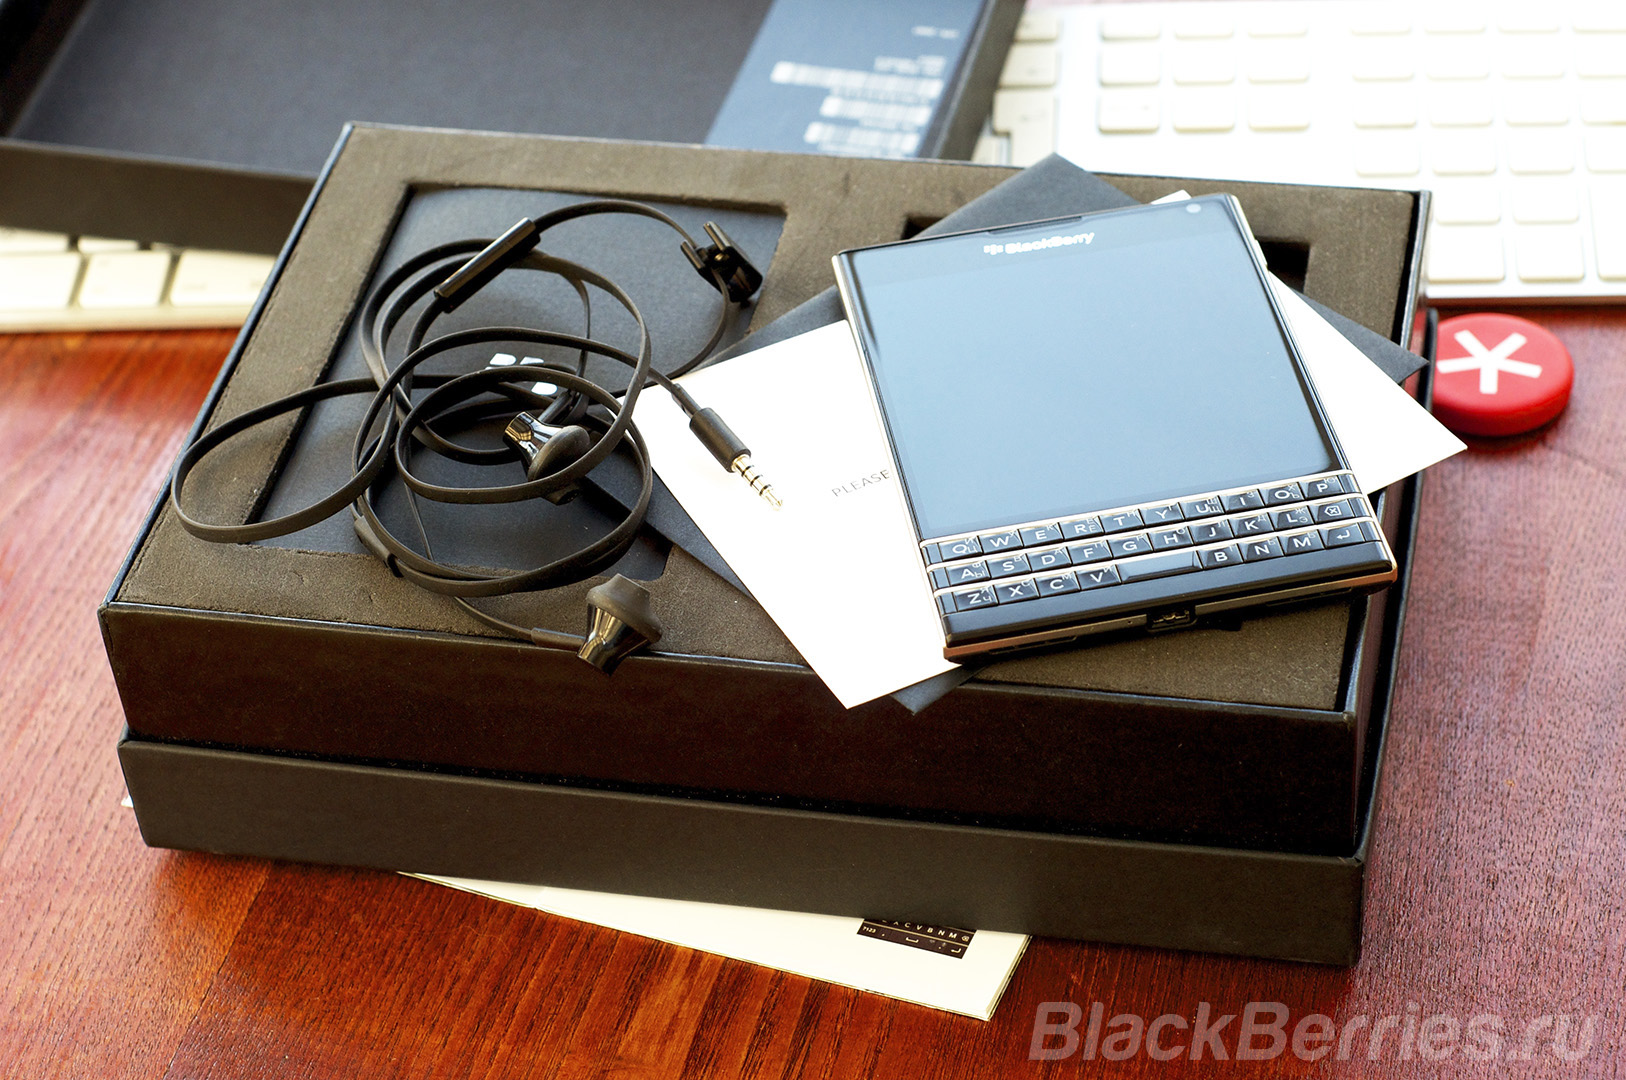 BlackBerry-Passport-Review-2016-48